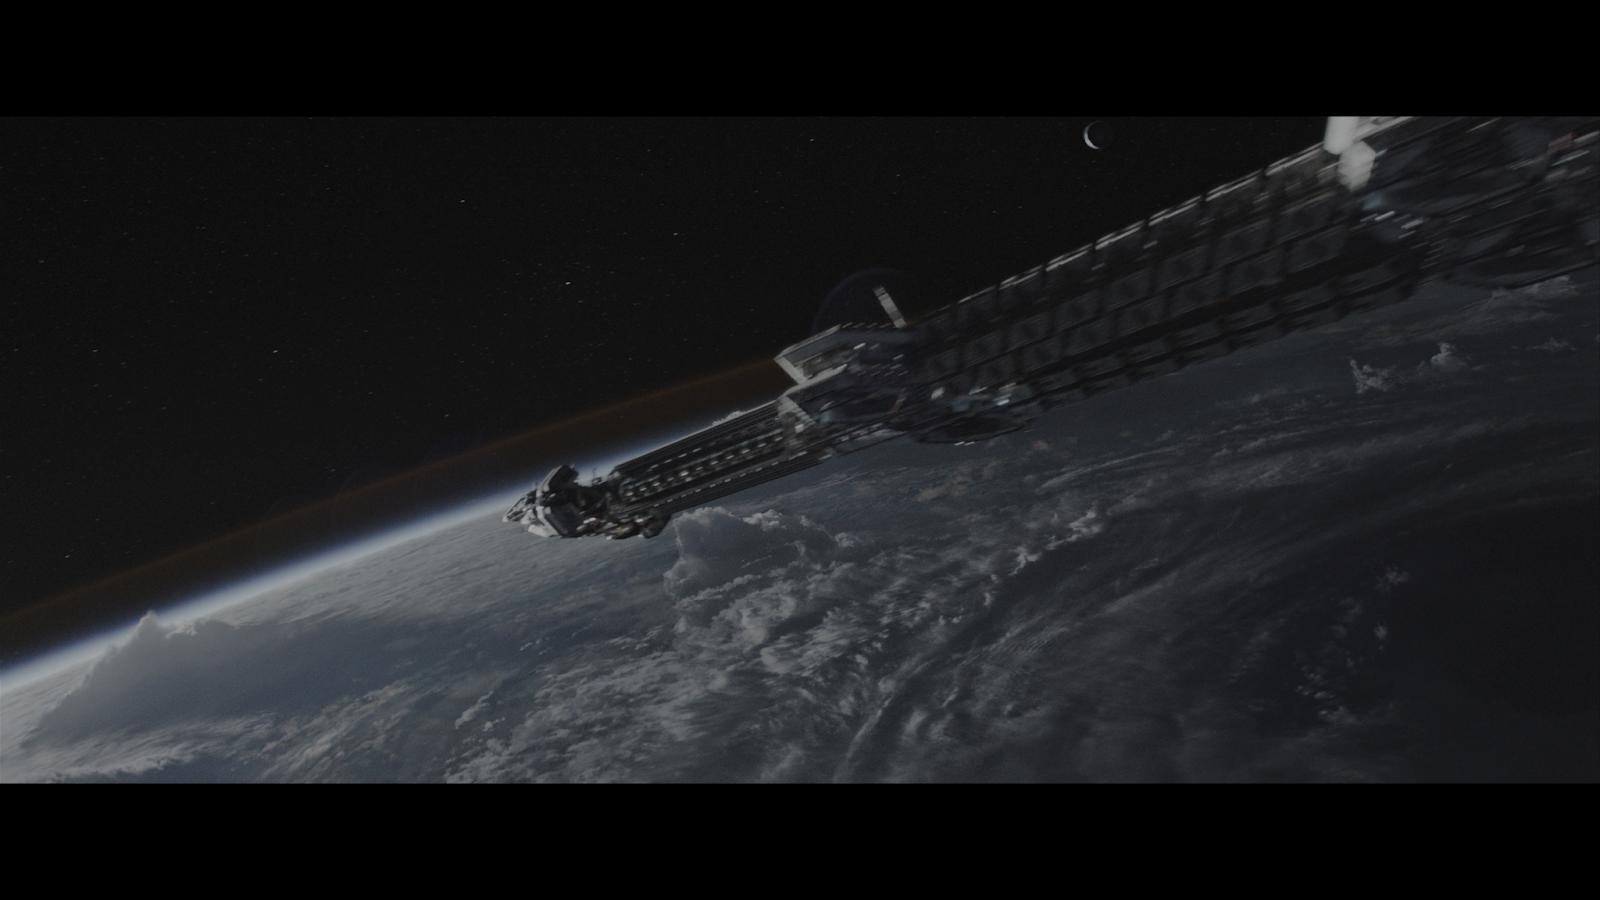 Alien: Covenant (2017) 4K UHD Blu-Ray Completo captura 2